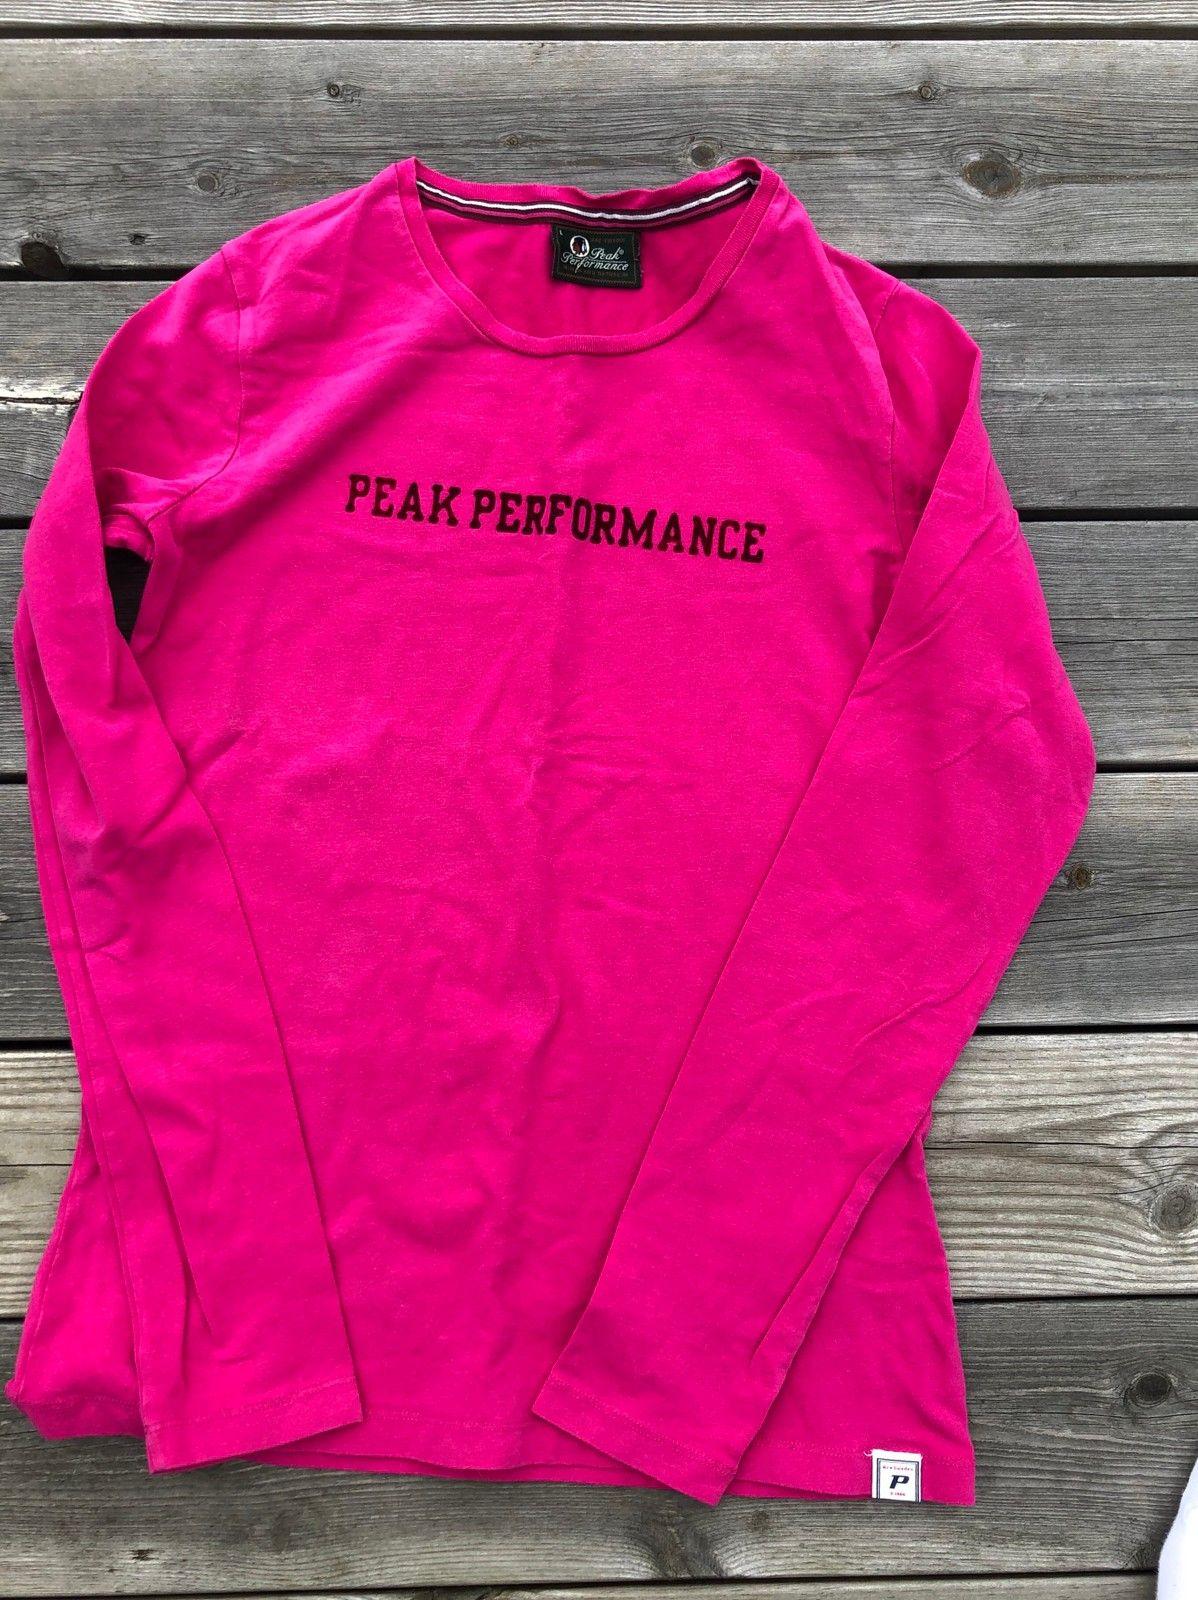 Peak Performance L genser dame | FINN.no